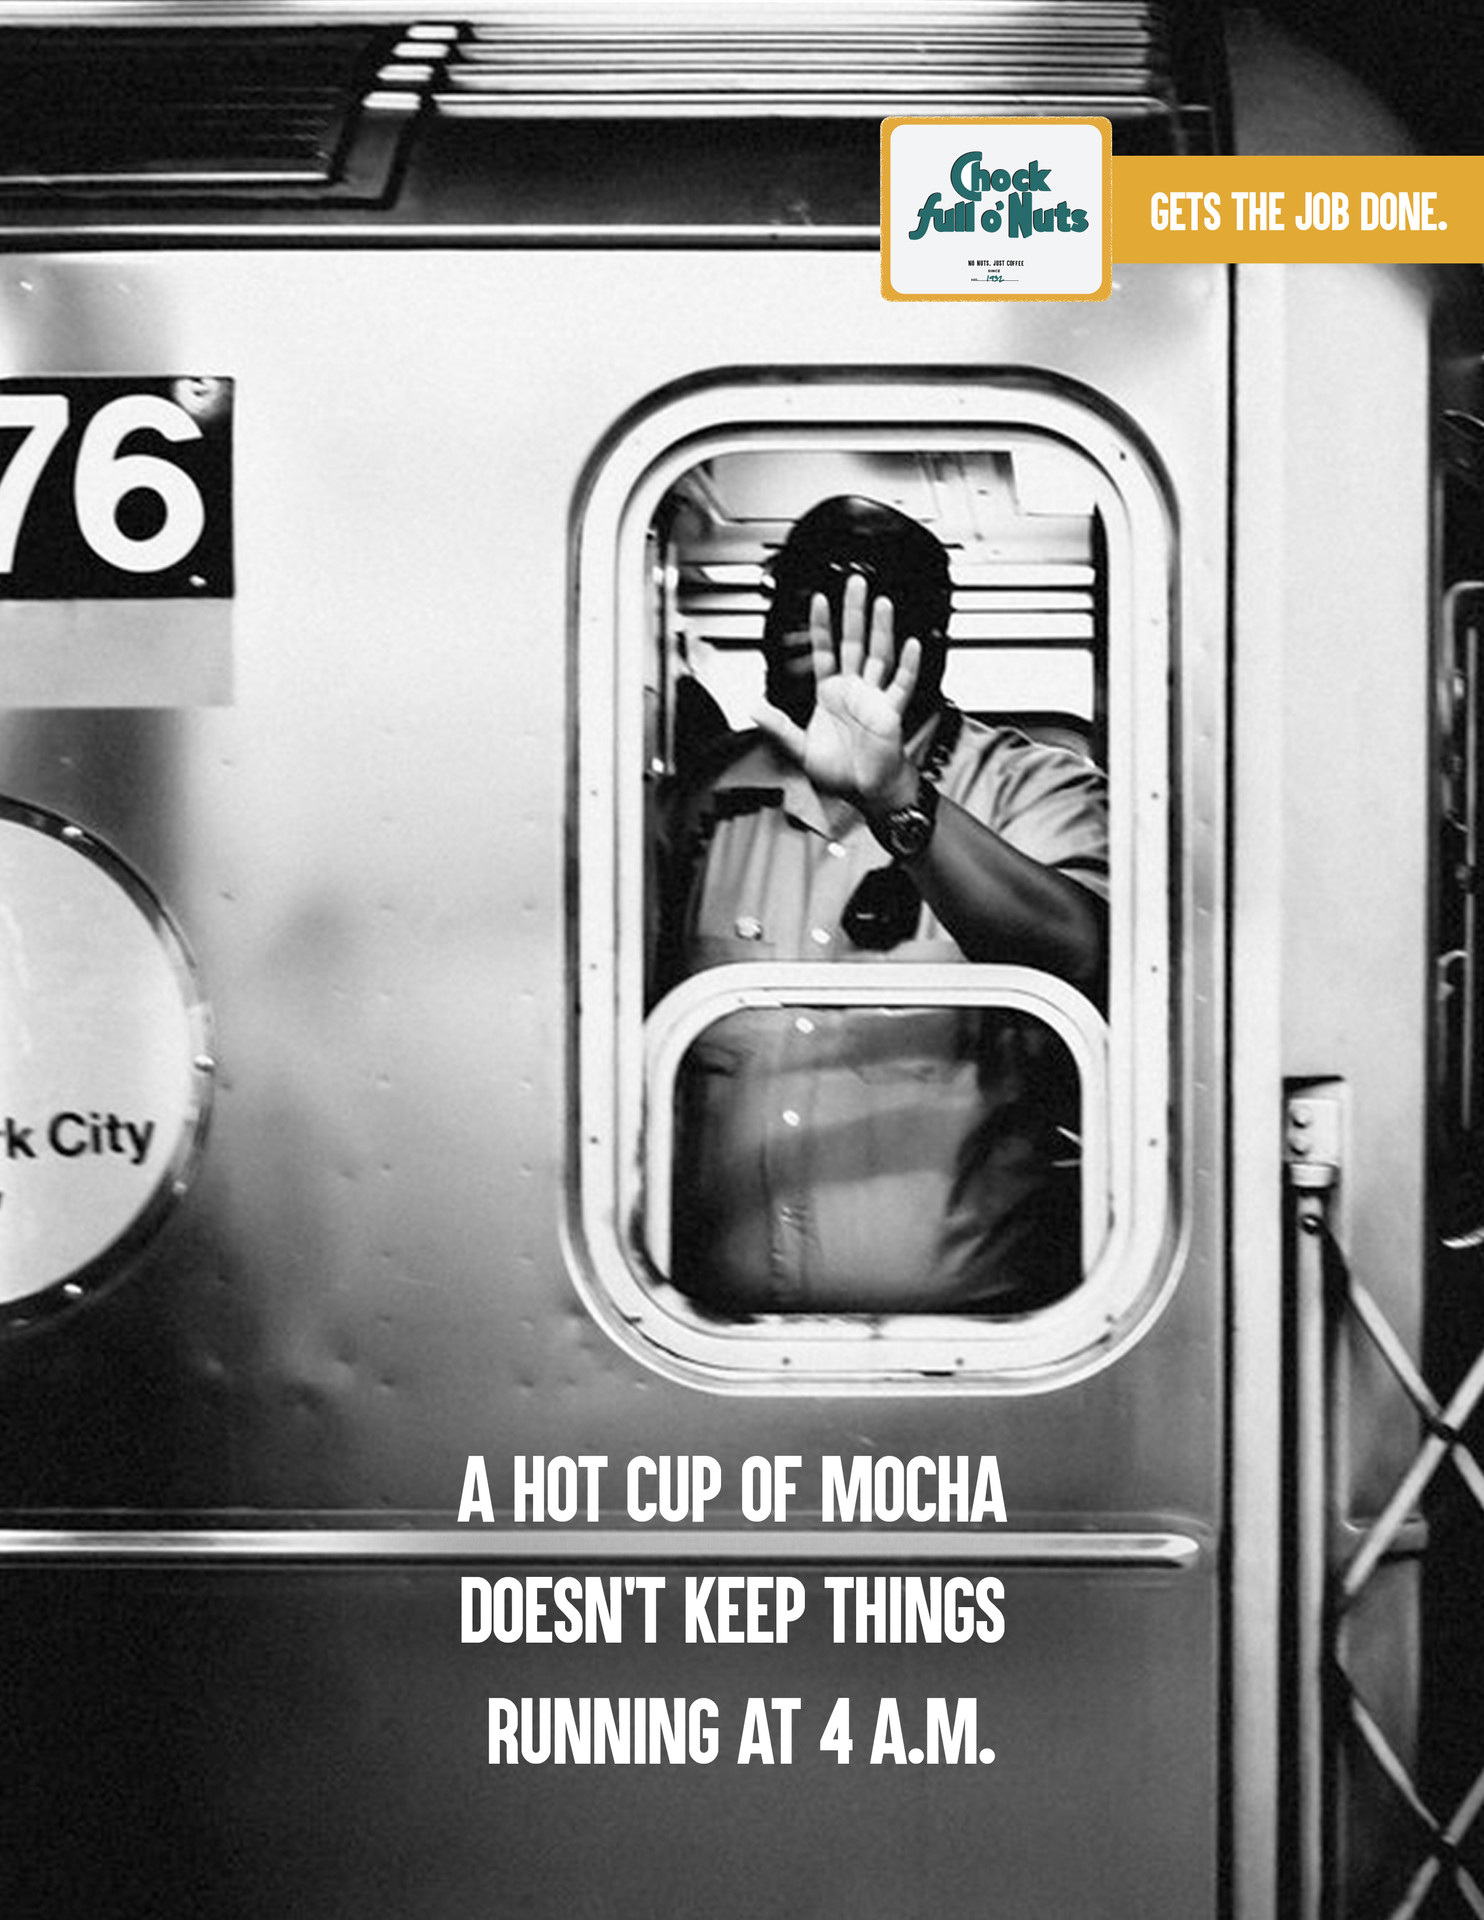 subway worker.jpg